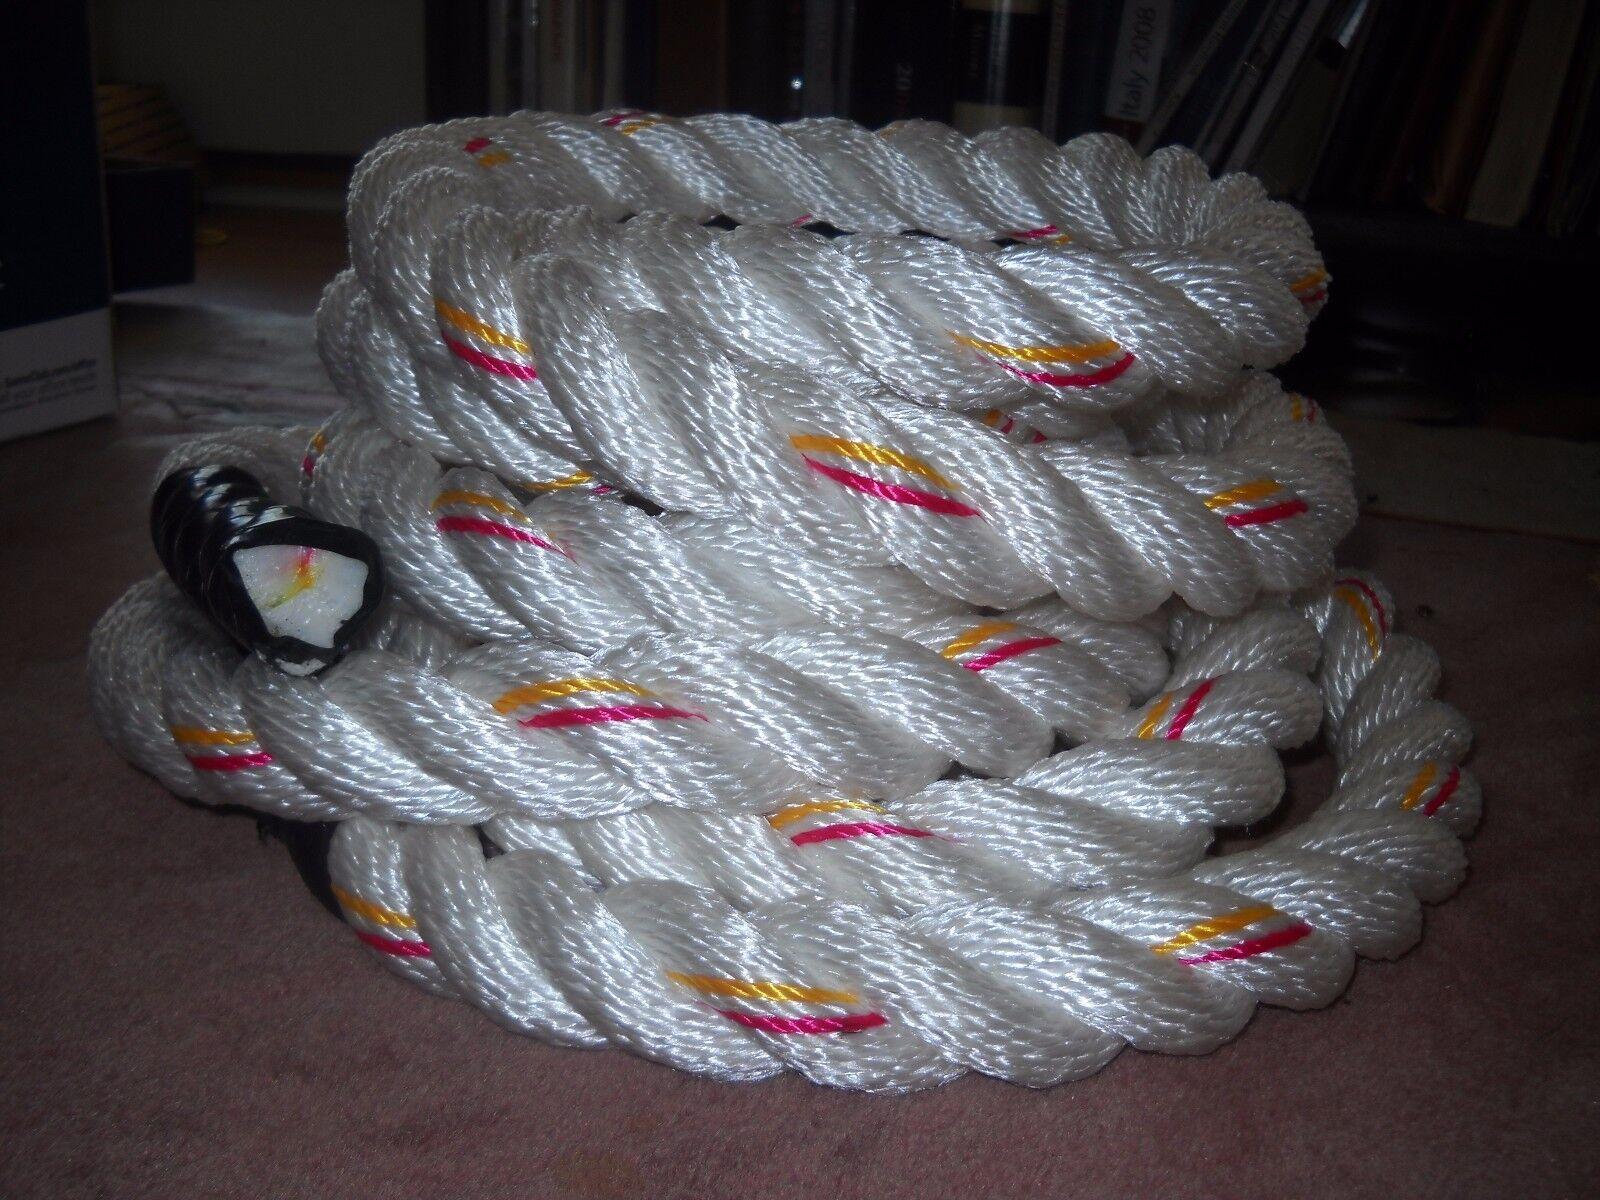 WORKOUT Rope 1 1/2 x 50 Polydacron GYM Workout UNDULATION Rope